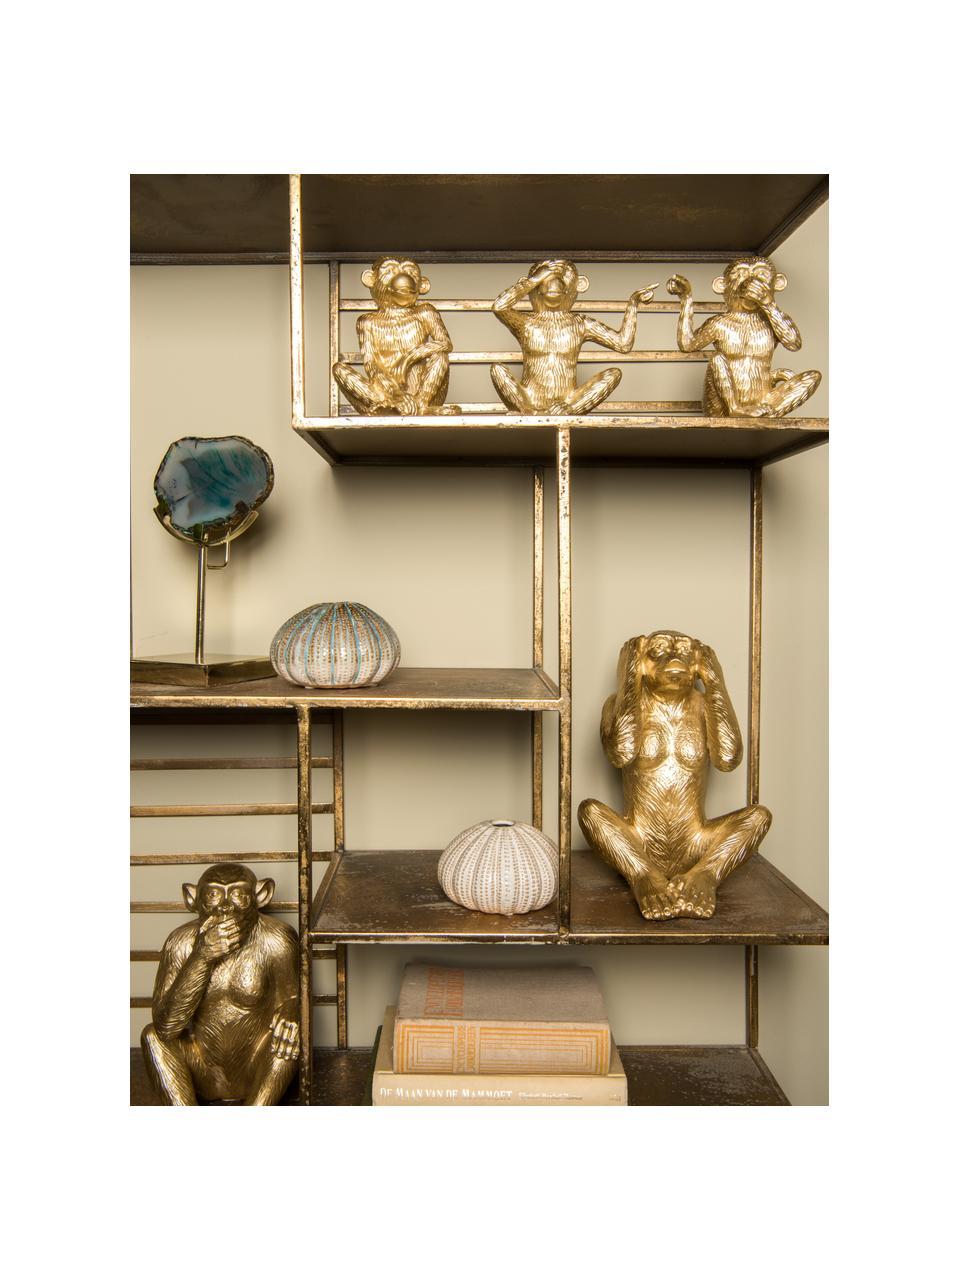 Oggetto decorativo Monkey, Poliresina, Dorato, Larg. 15 x Alt. 15 cm